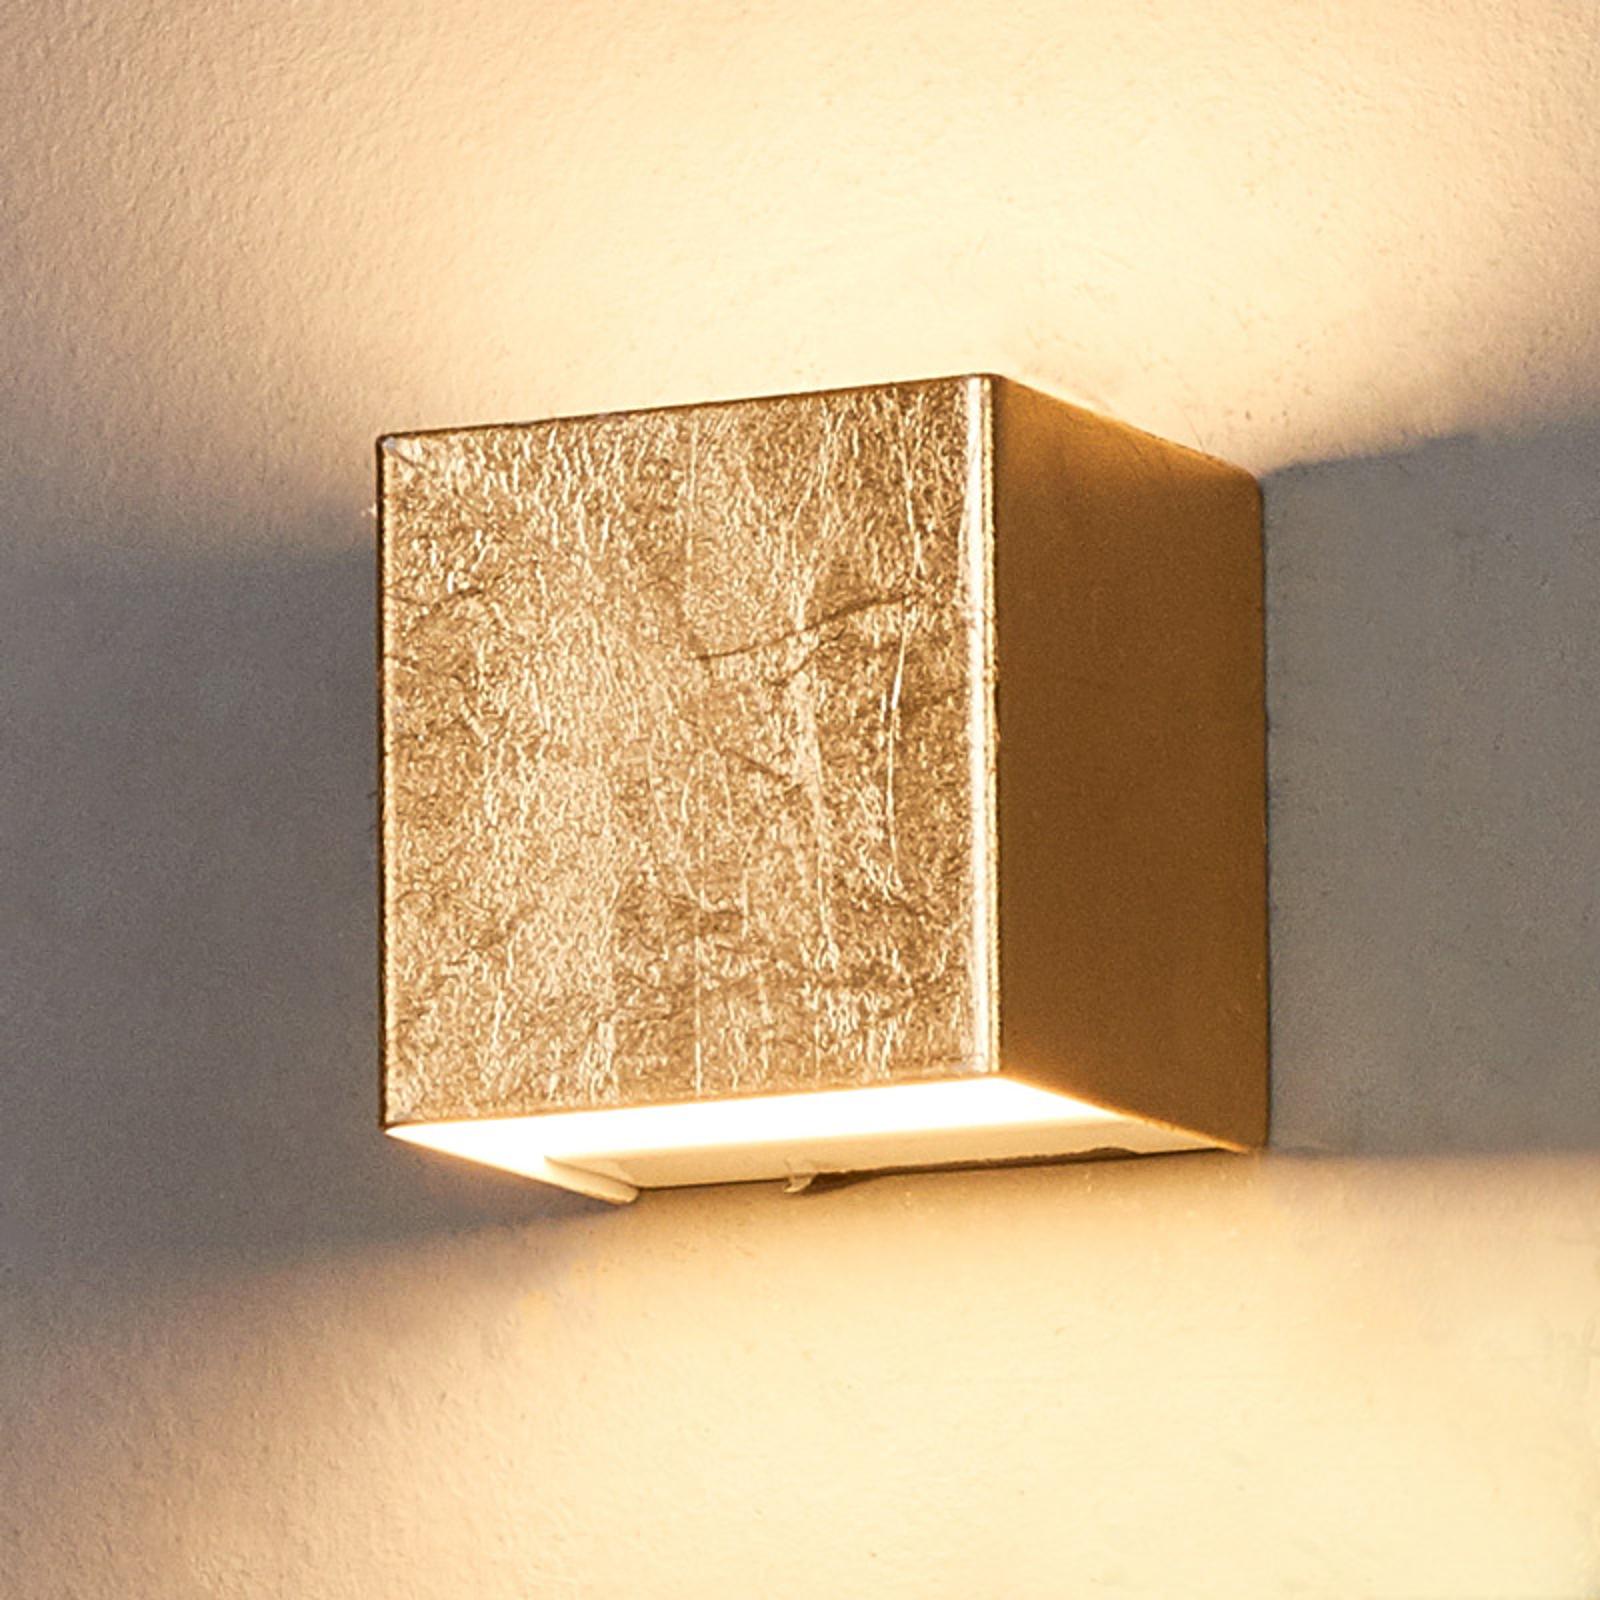 LED-Wandlampe Quentin, gold, 9 cm breit